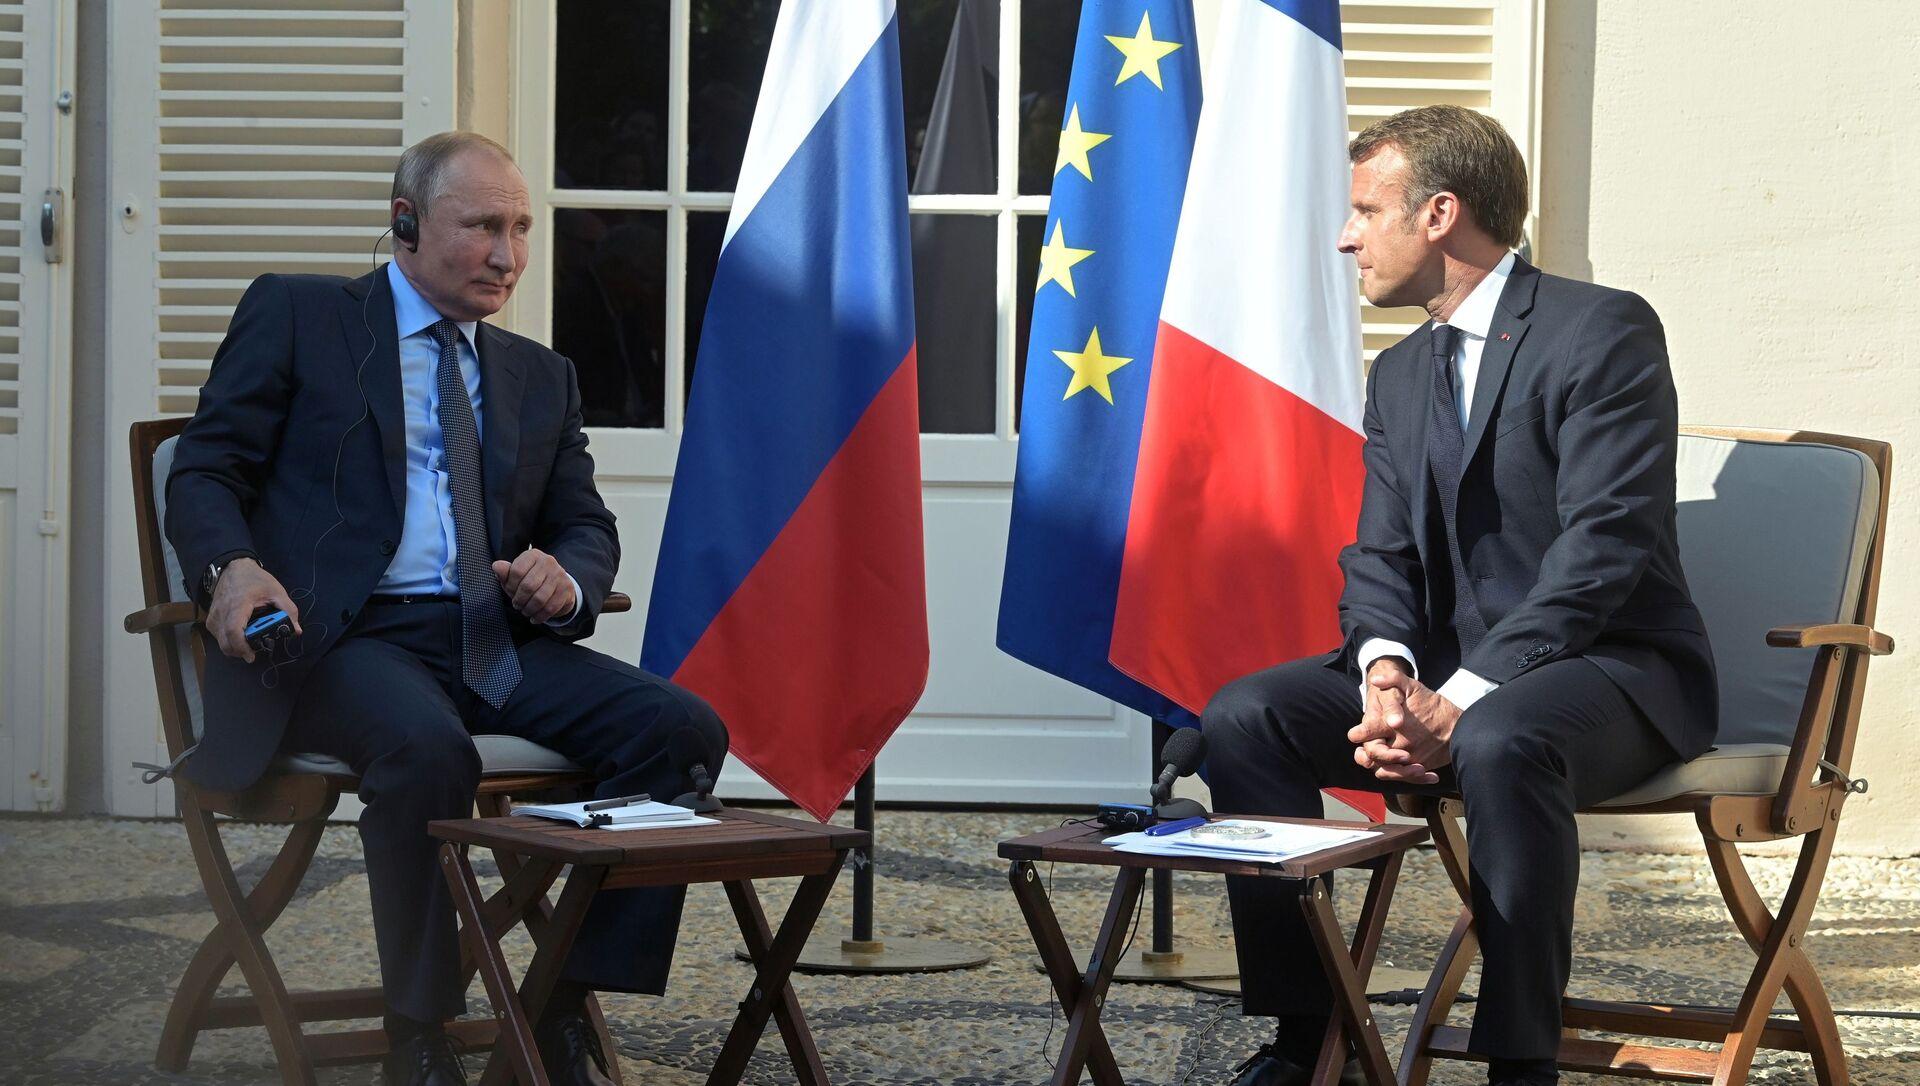 Рабочий визит президента РФ В. Путина во Францию - Sputnik Азербайджан, 1920, 19.08.2021